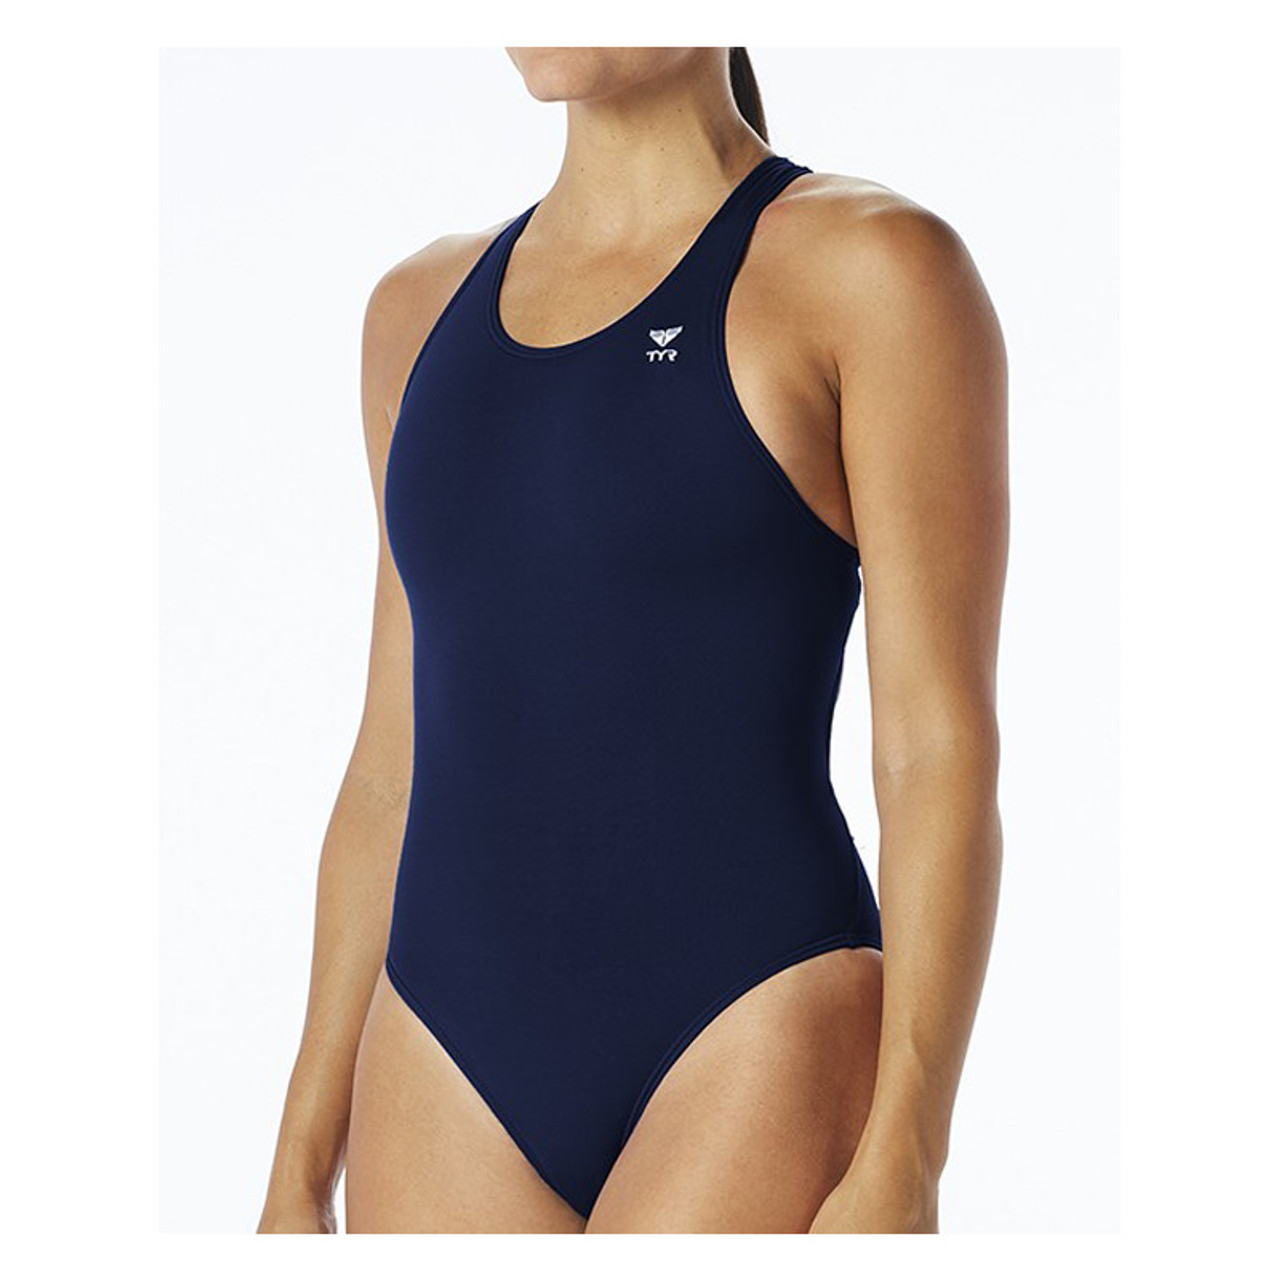 TYR Sport Womens Solid Maxback Swim Suit